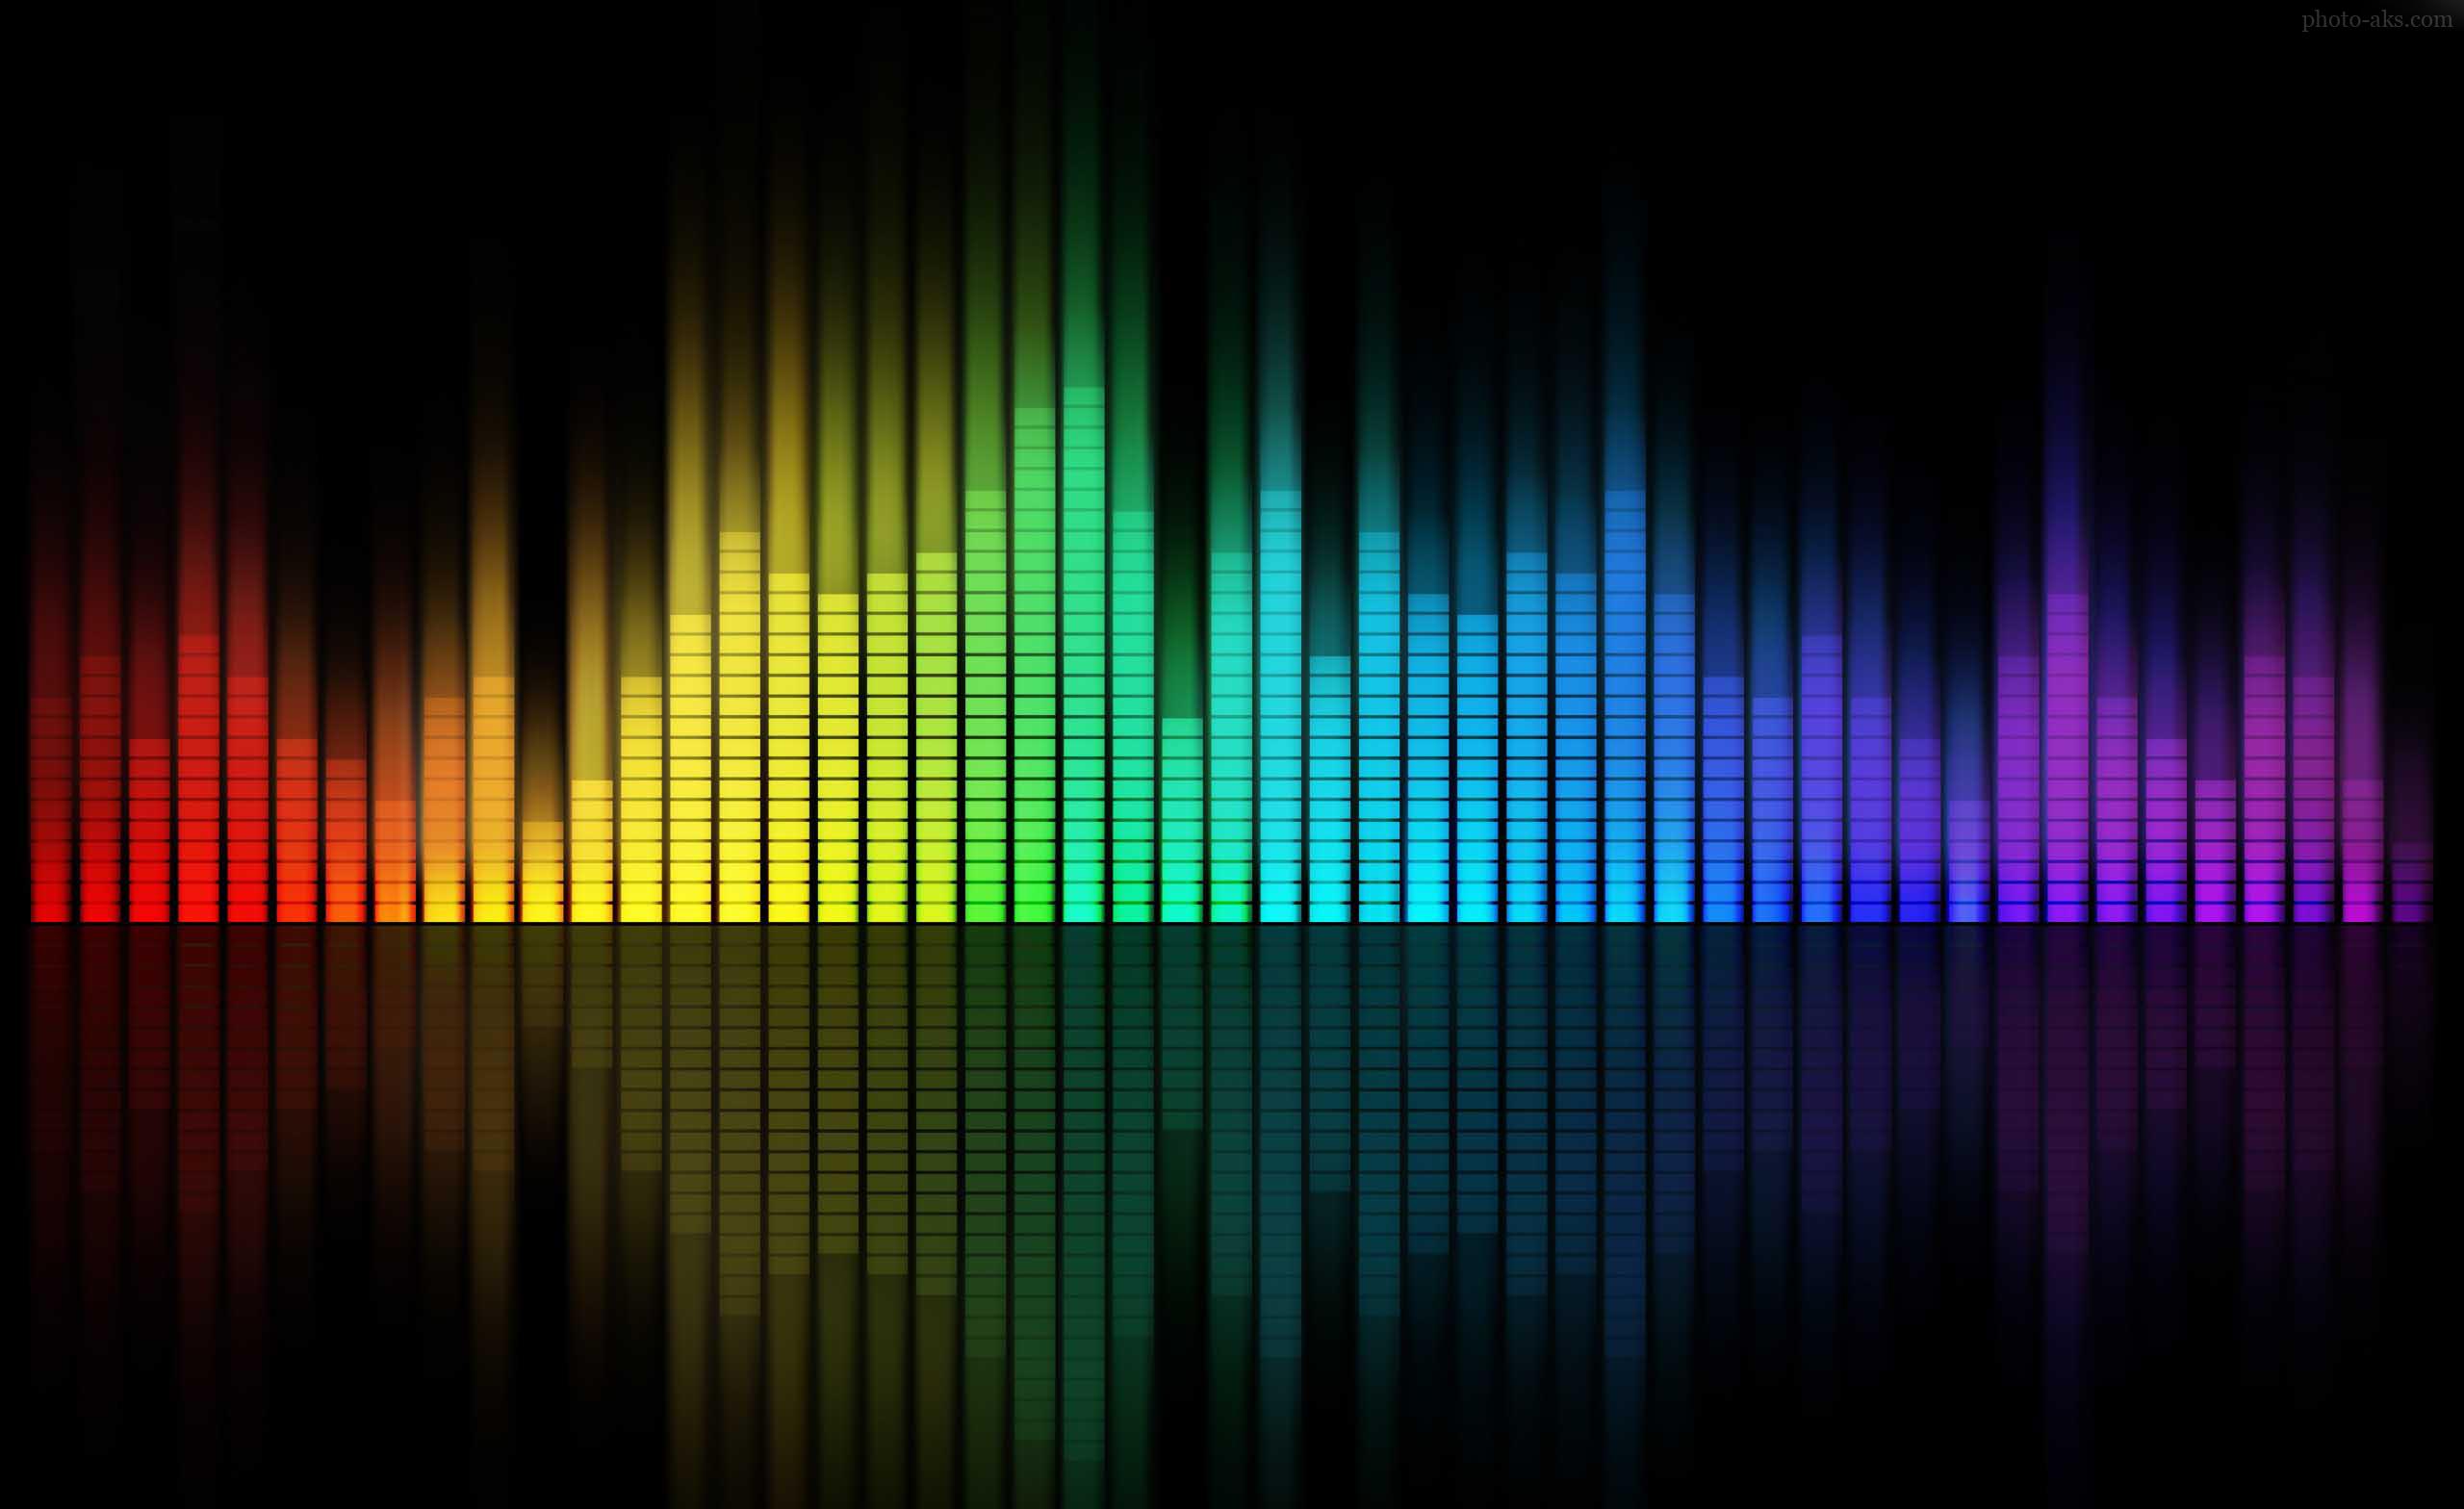 اکولایزر کامپیوتری موسیقی رنگارنگ مخصوص پس زمینه